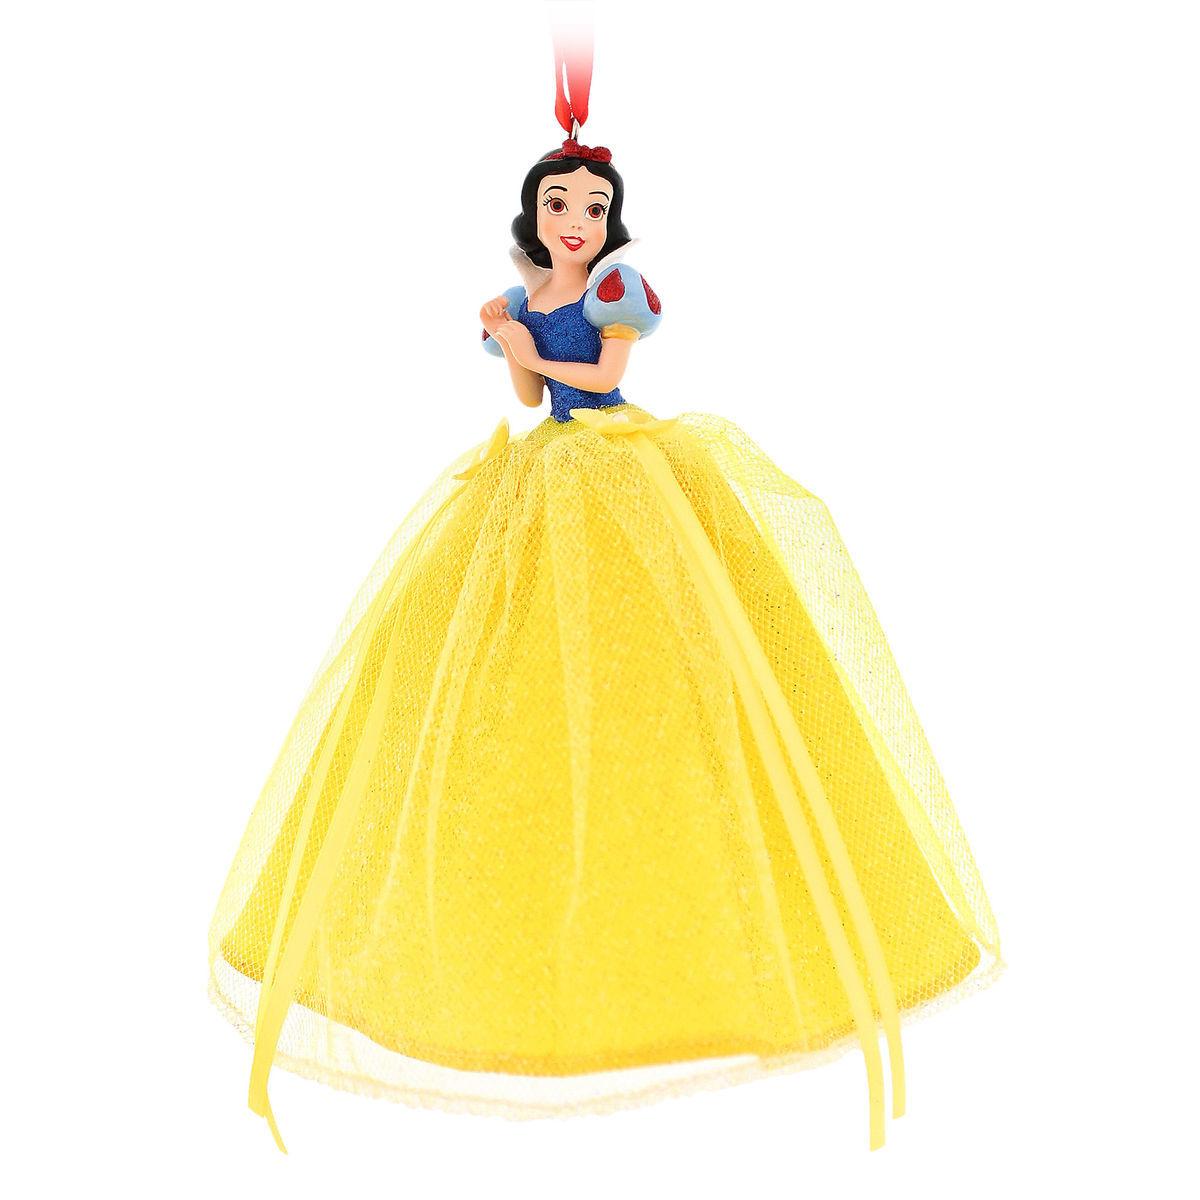 Disney Christmas Ornament - Princess Snow White - Tulle Gown